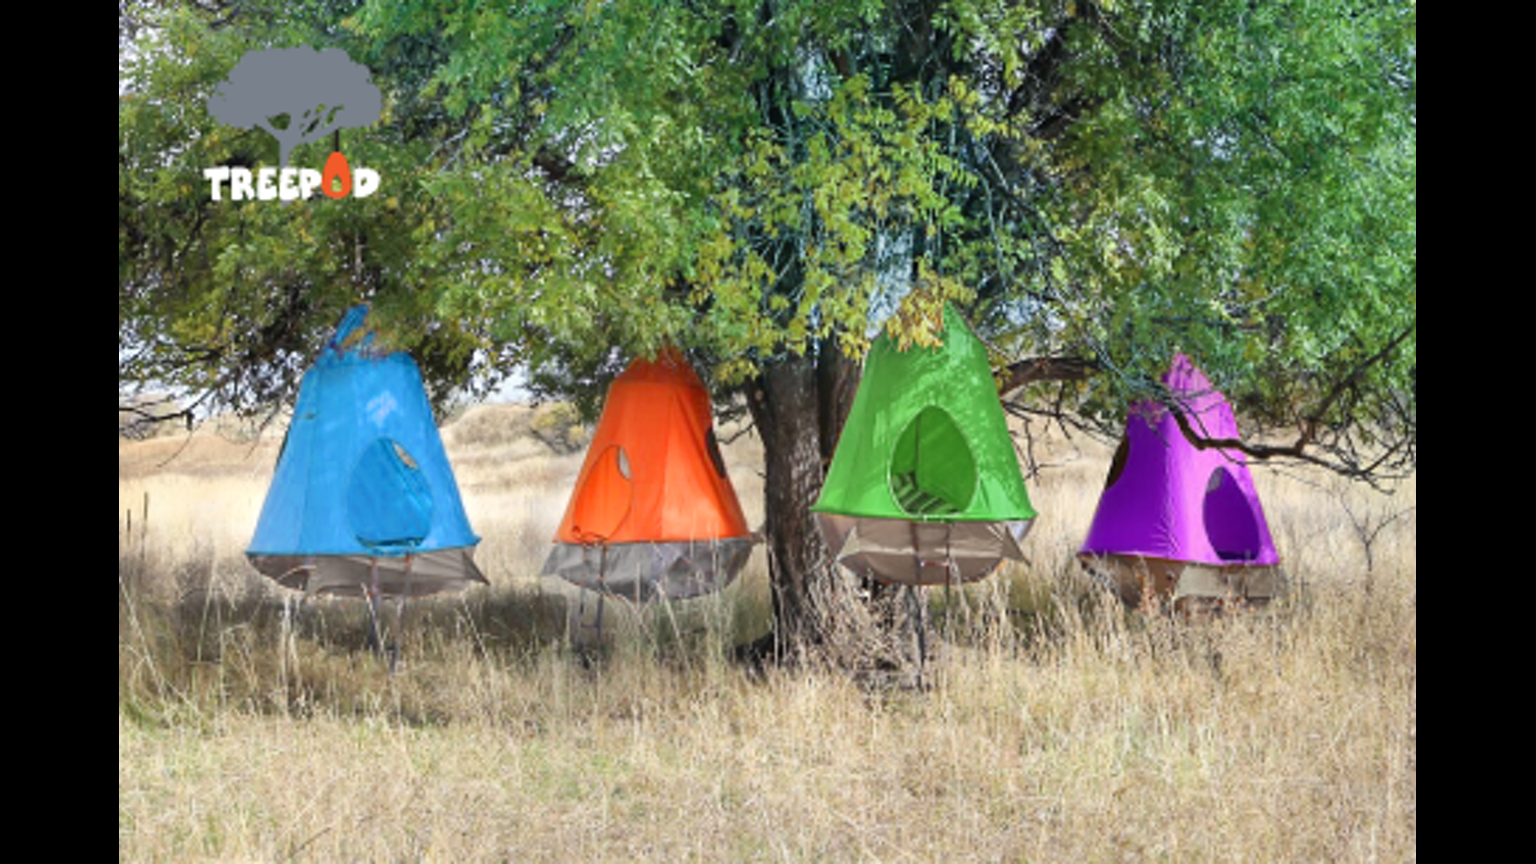 treepod-picture